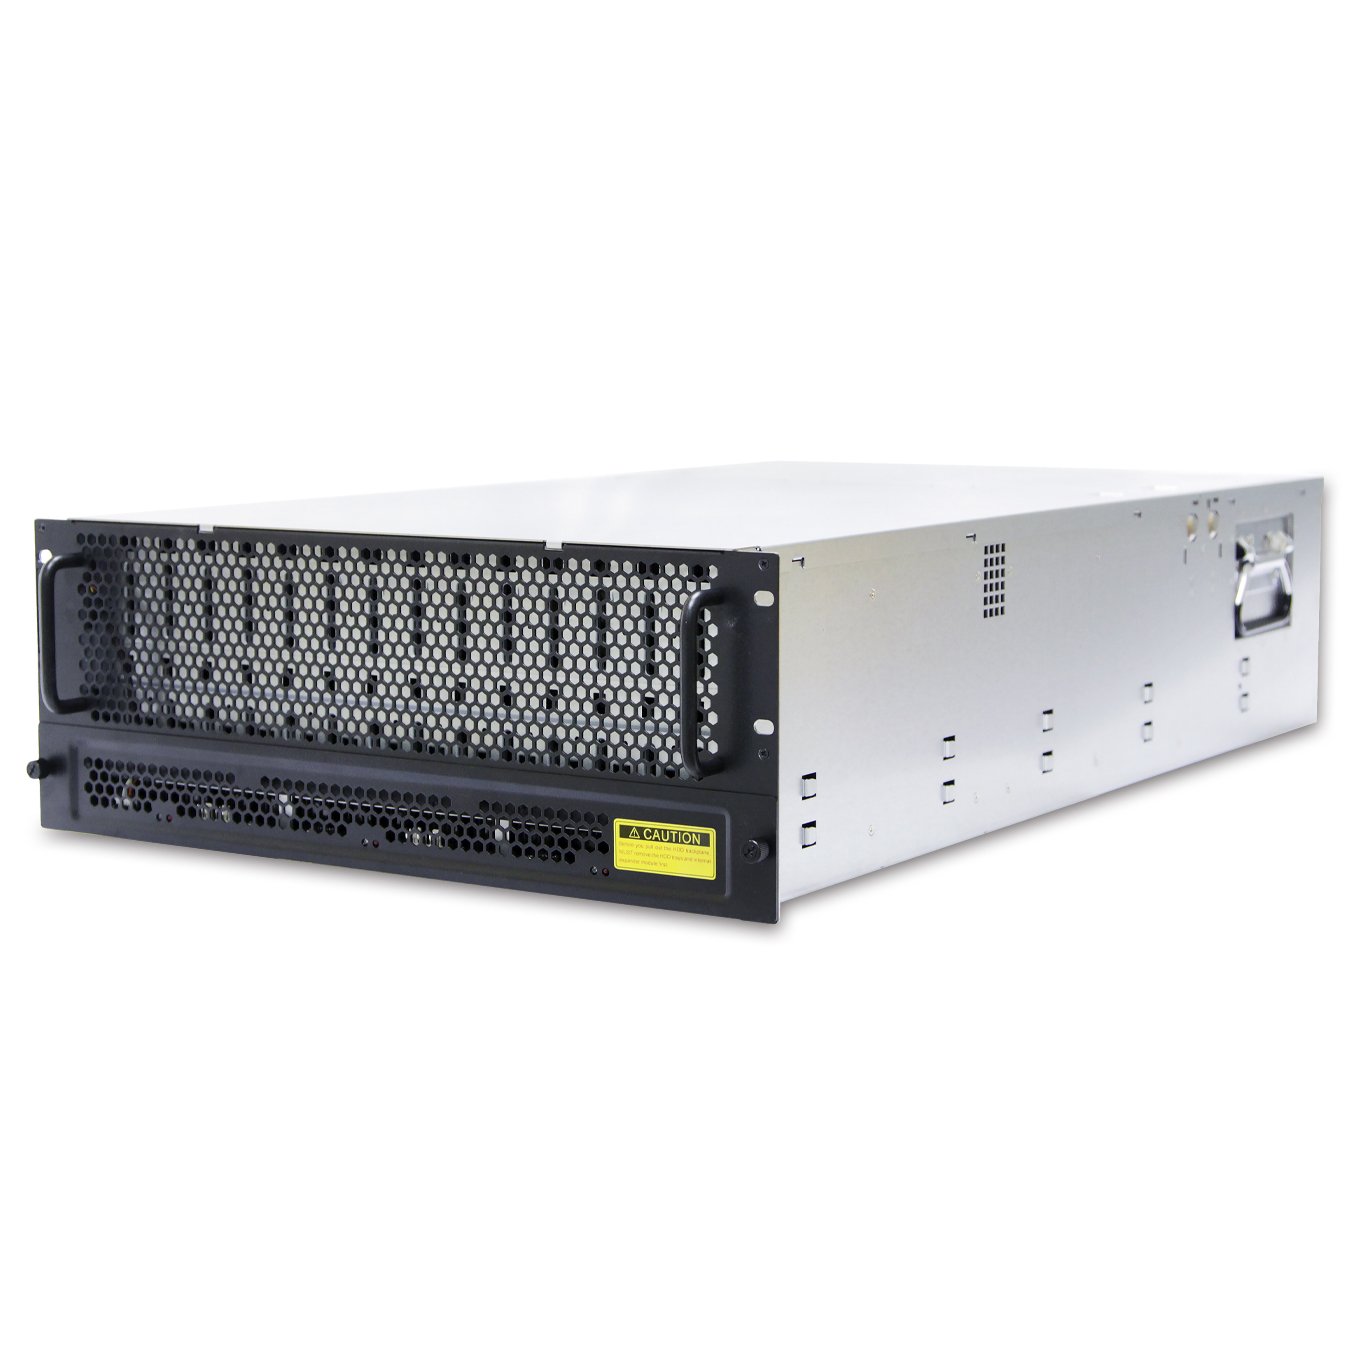 4U 60 3.5inch bays JBOD (Single Expander)